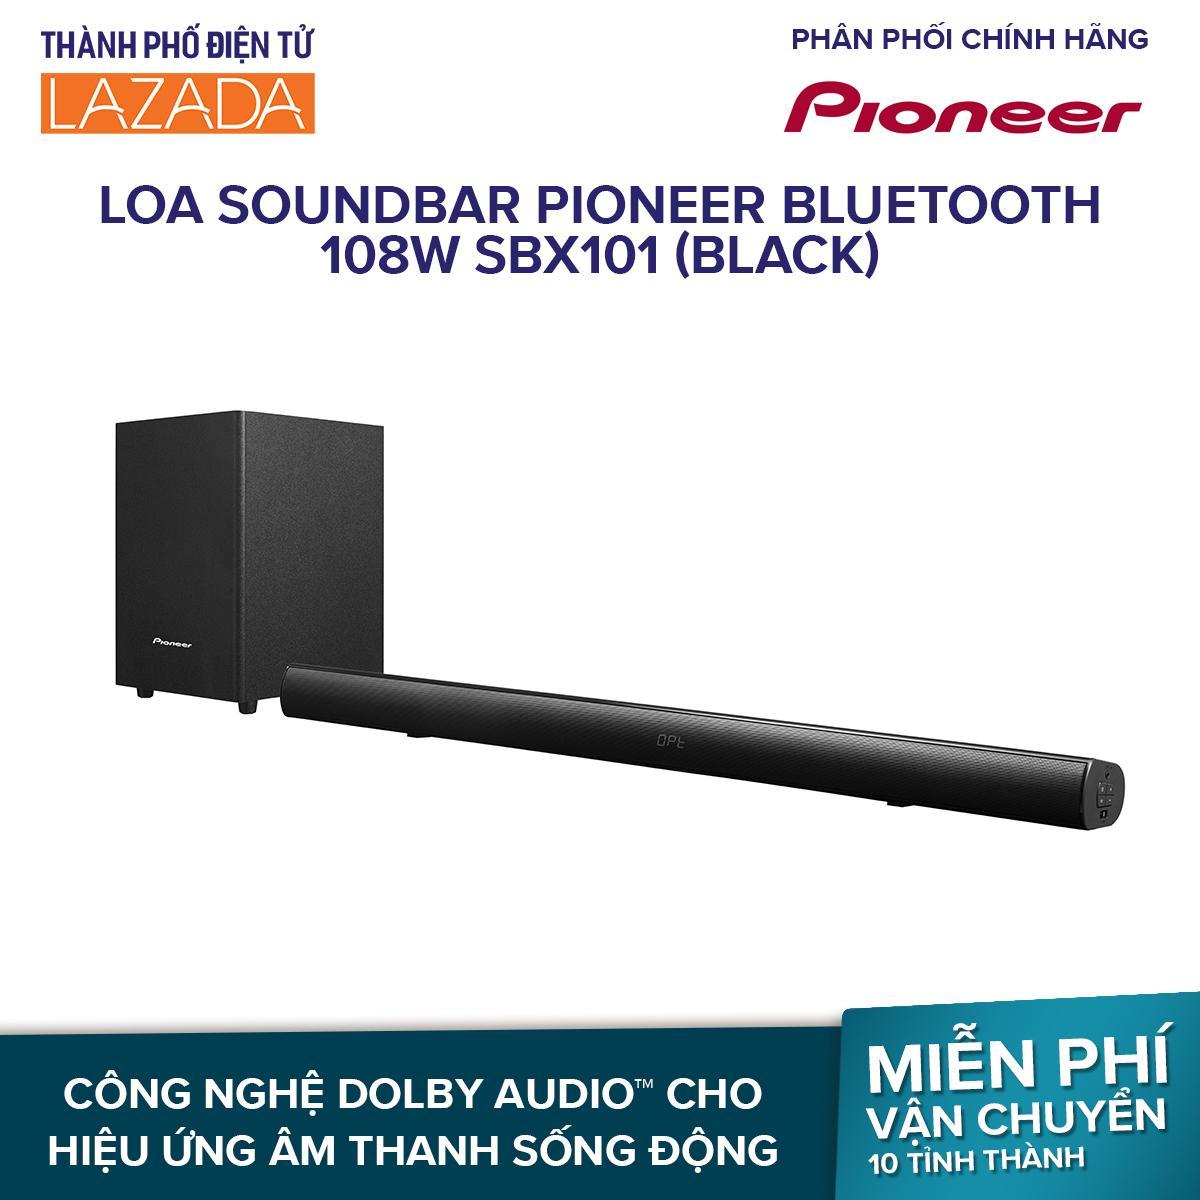 Loa Soundbar Pioneer Bluetooth 108W SBX101 (Black)